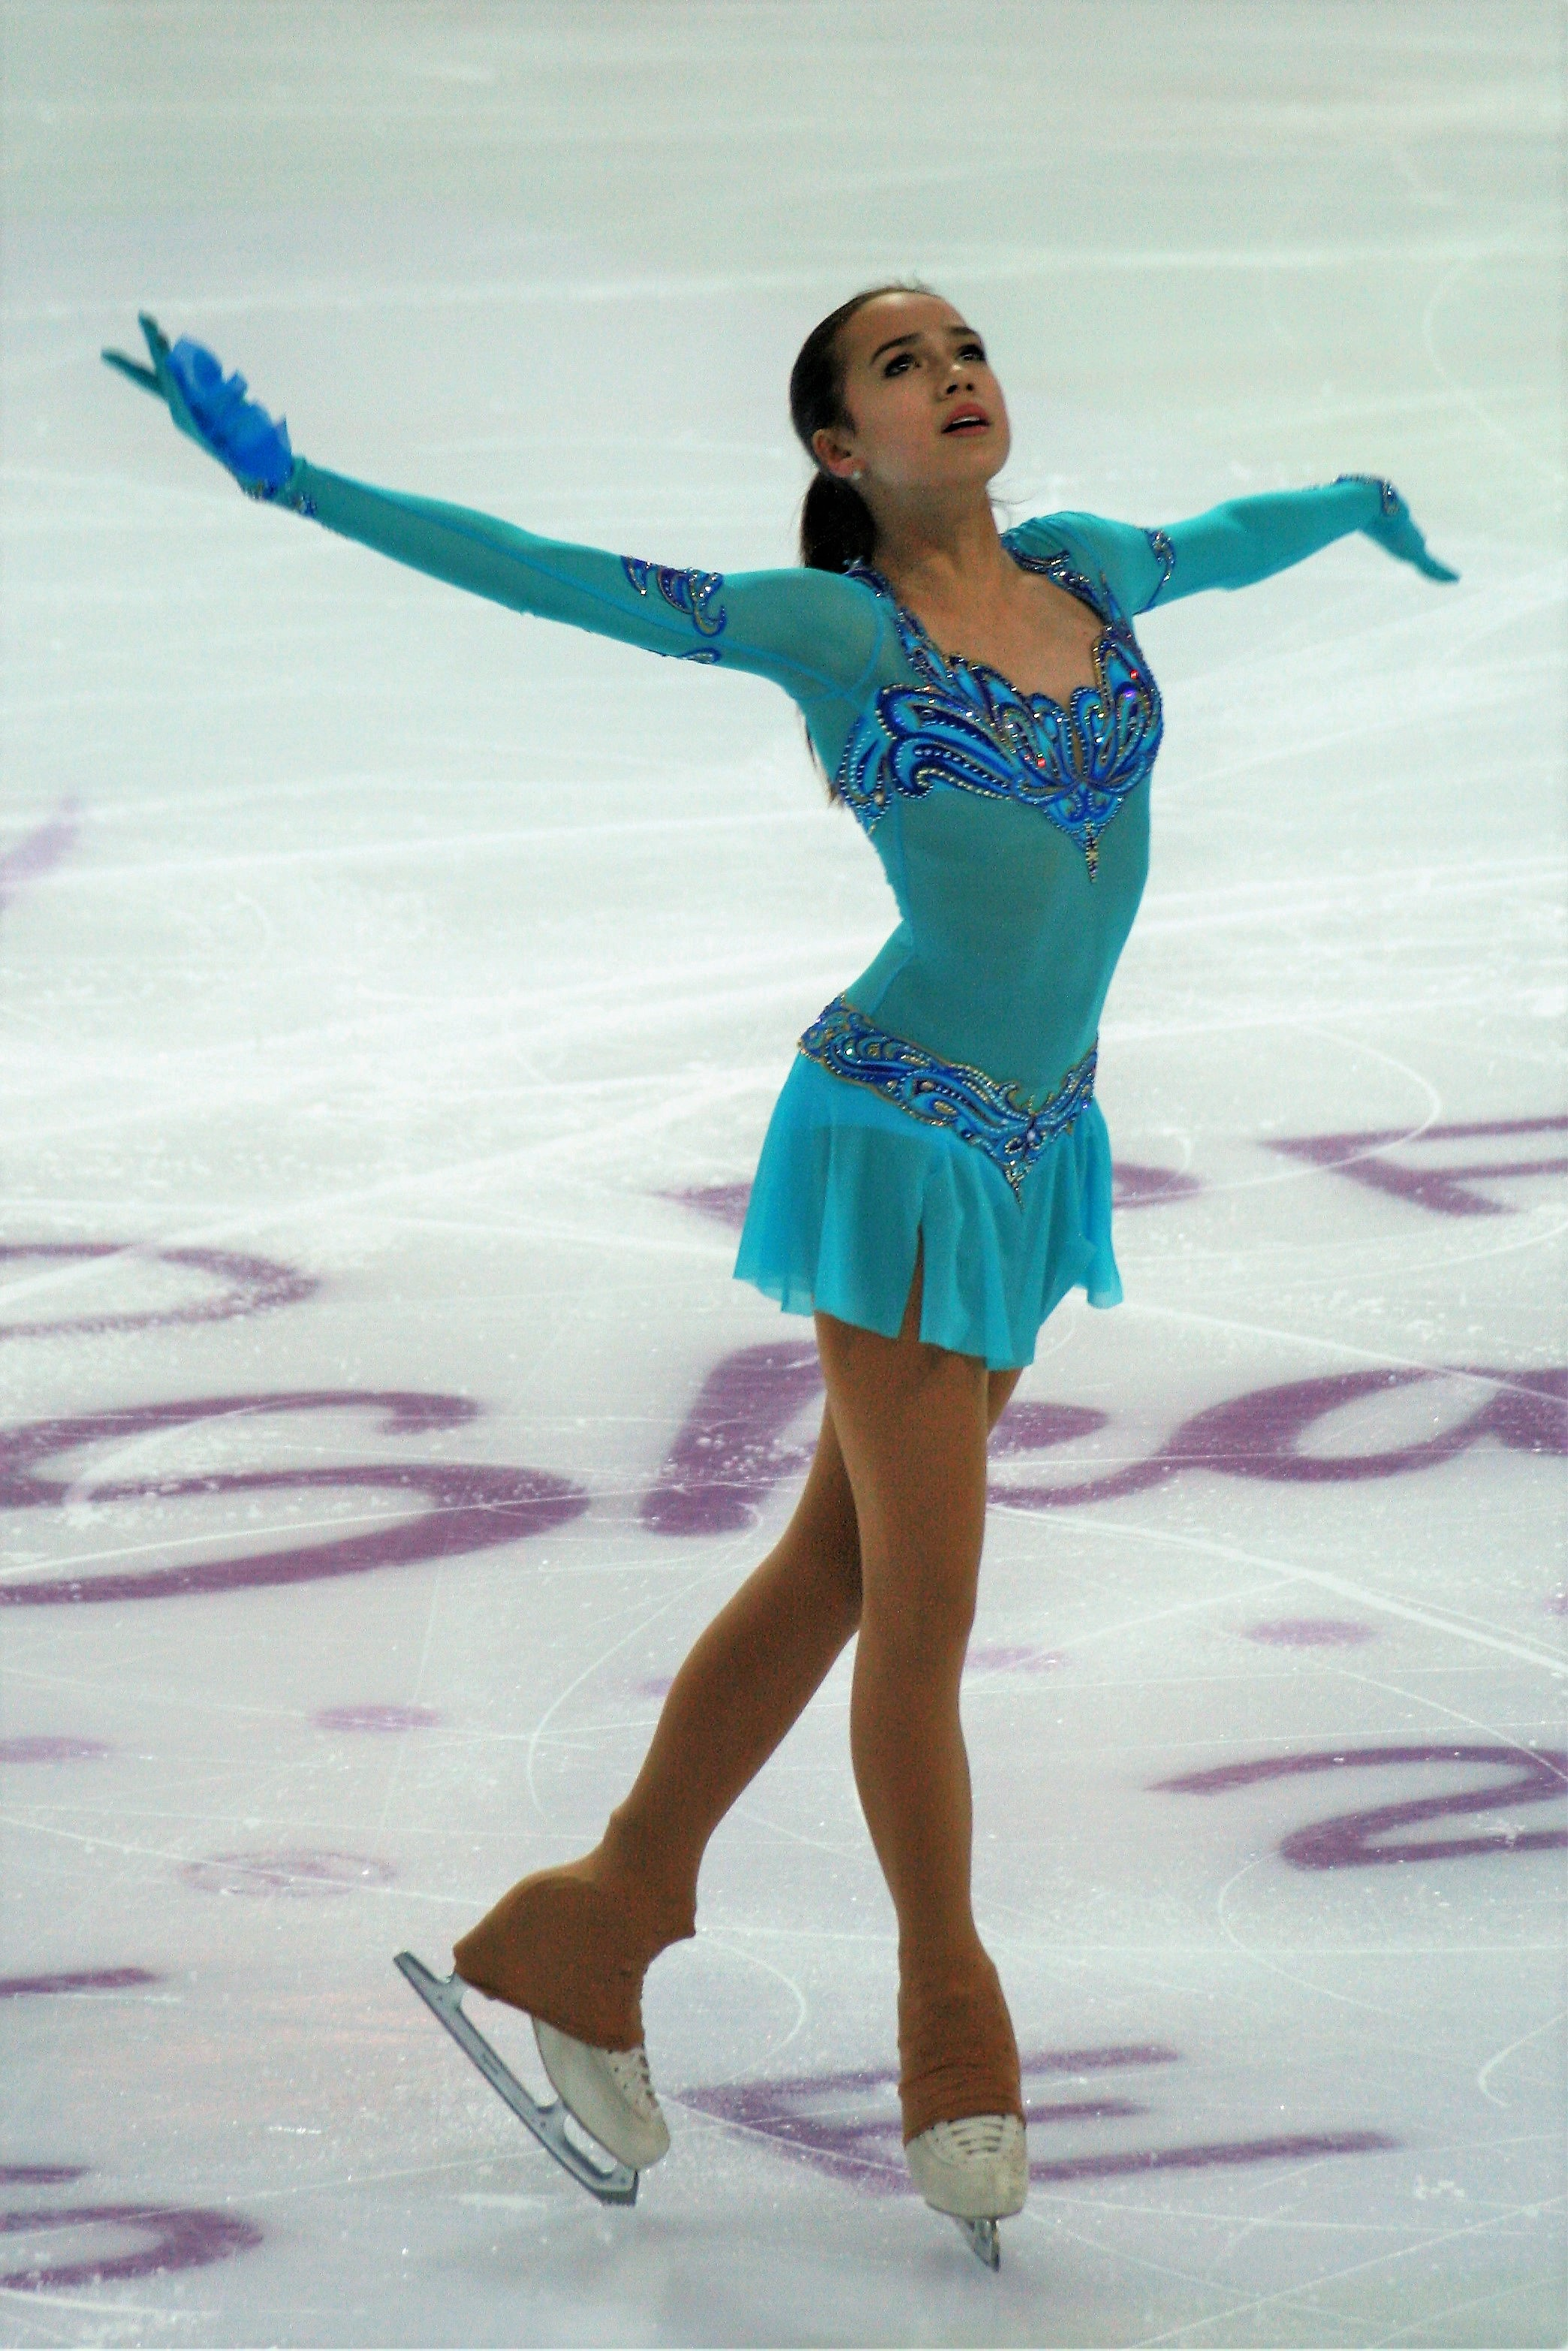 file2016 grand prix of figure skating final alina